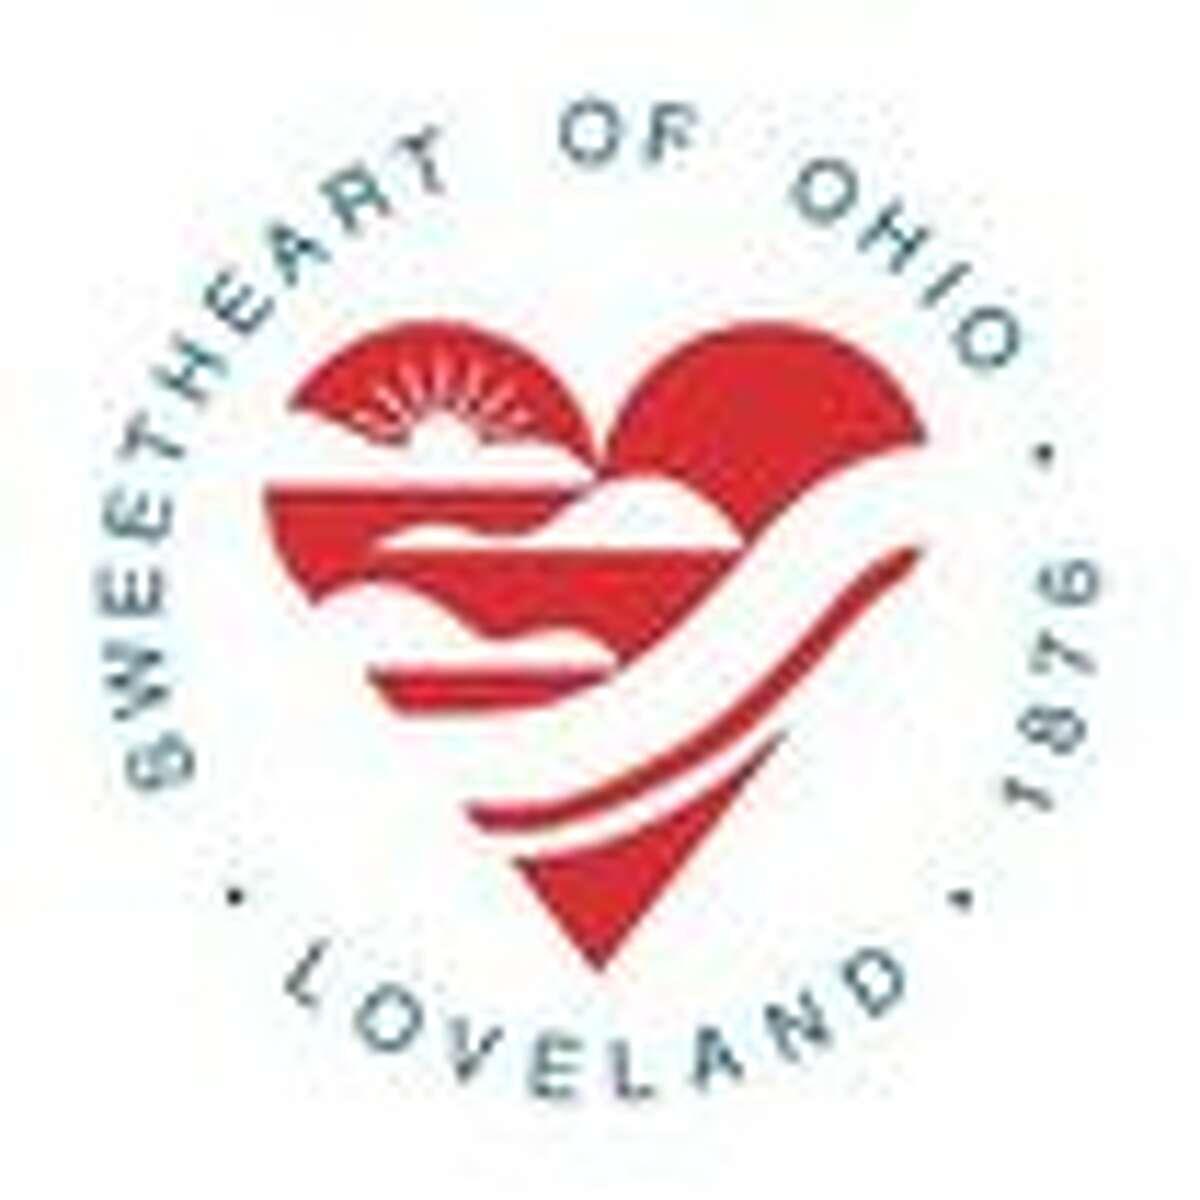 Organization Profile Image: Loveland City Council